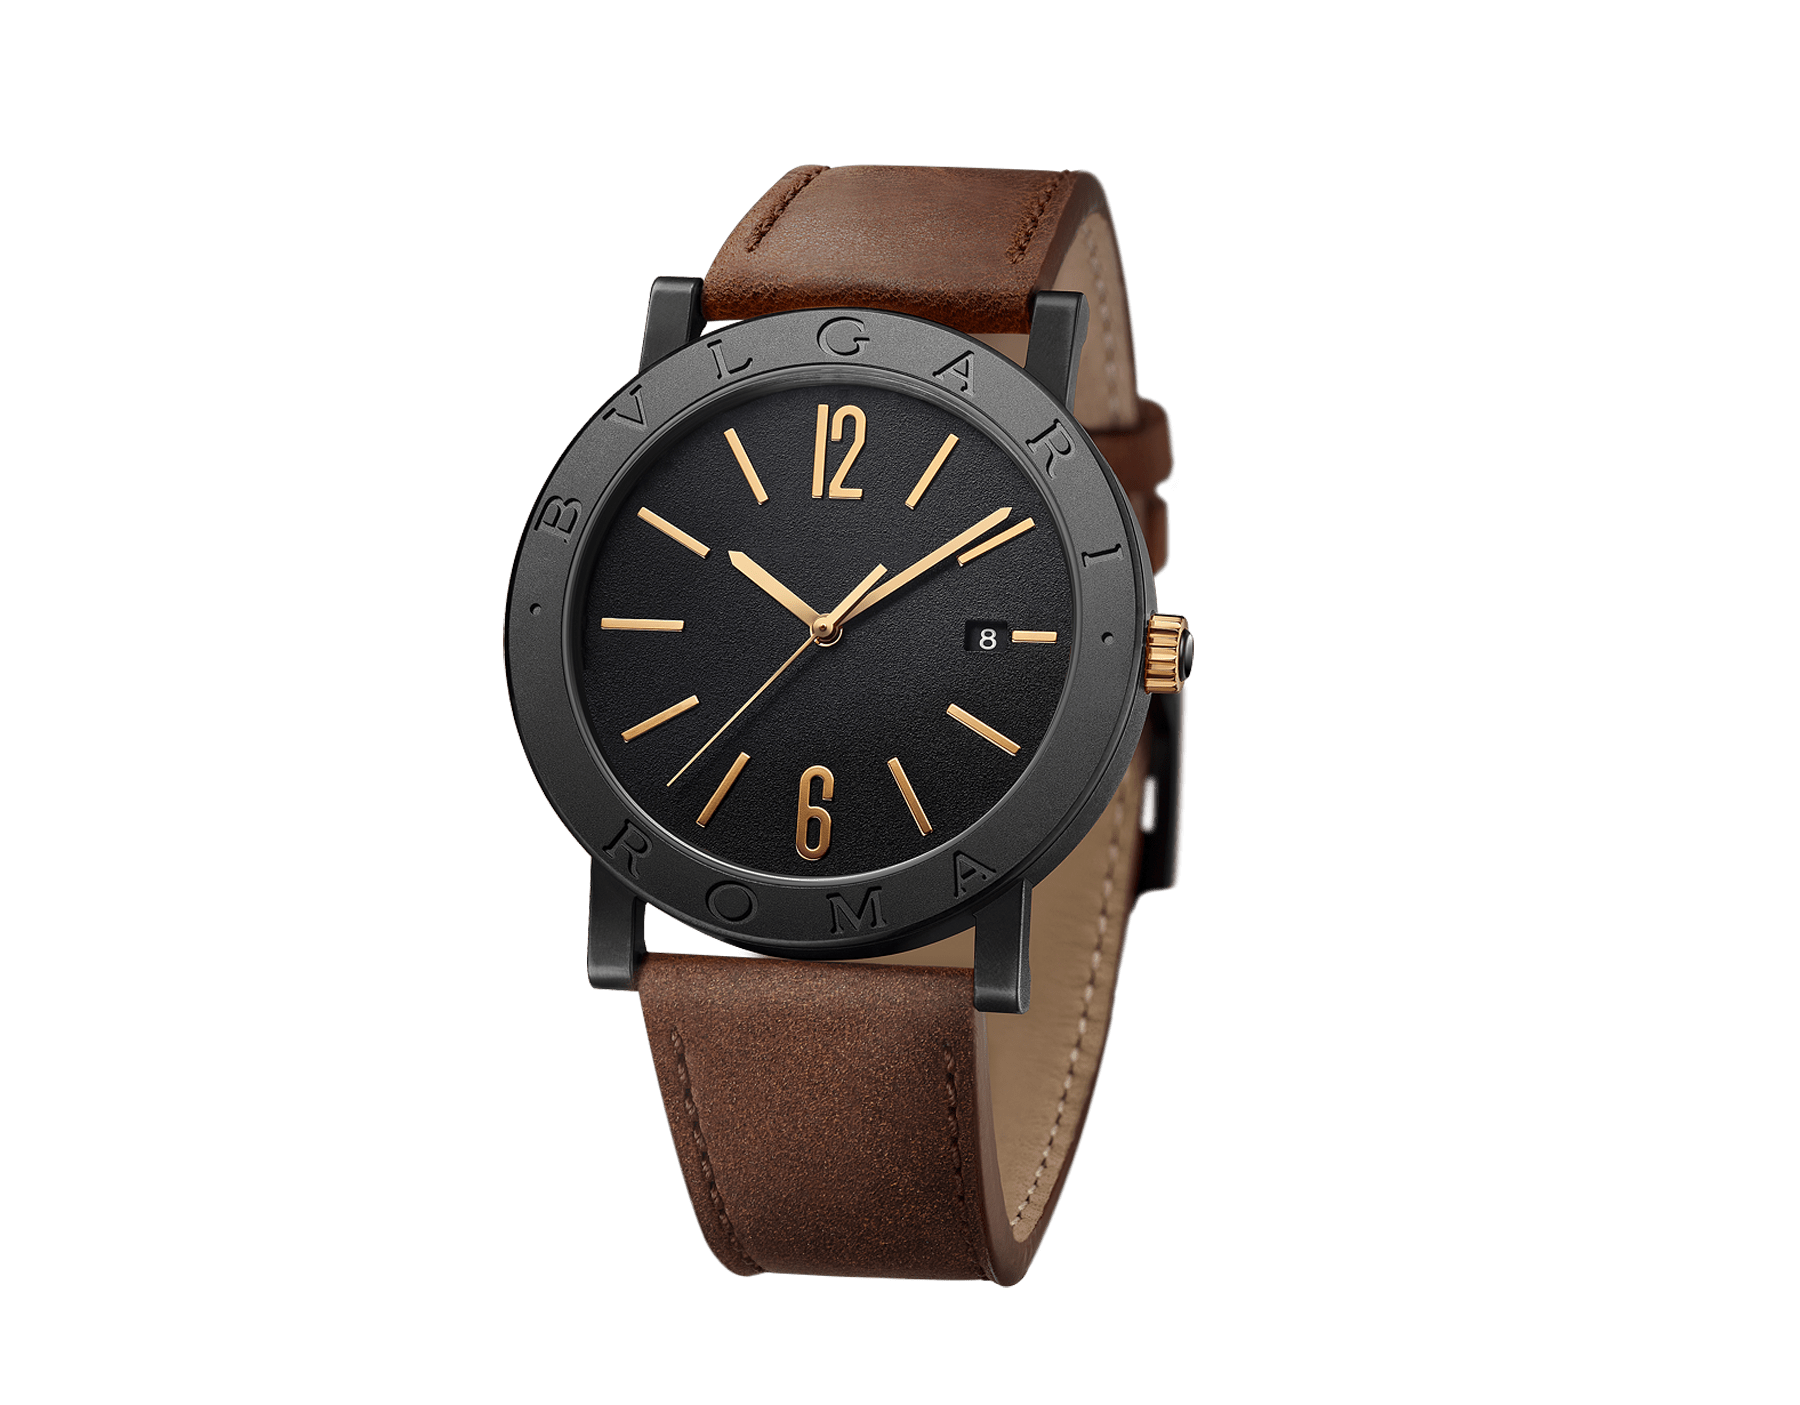 BVLGARI BVLGARI 城市特別版「羅馬」腕錶,搭載機械機芯,自動上鍊。精鋼錶殼,黑色 DLC 類鑽碳高耐磨鍍膜。錶圈鐫刻 BVLGARI ROMA 字樣,透明底蓋。黑色漆面錶盤,玫瑰金時標。棕色小牛皮錶帶,可換式黑色橡膠錶帶。 103219 image 3